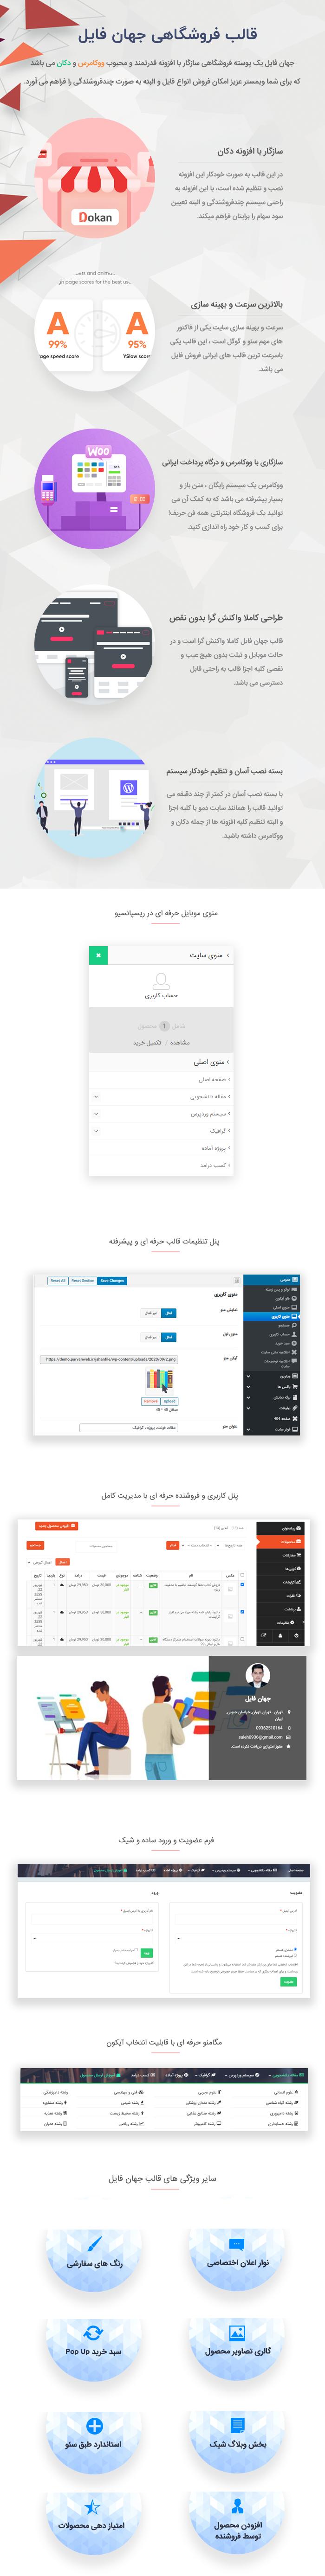 jahanfile theme wordpress file shop - قالب فروش فایل وردپرس | قالب جهان فایل چند فروشندگی